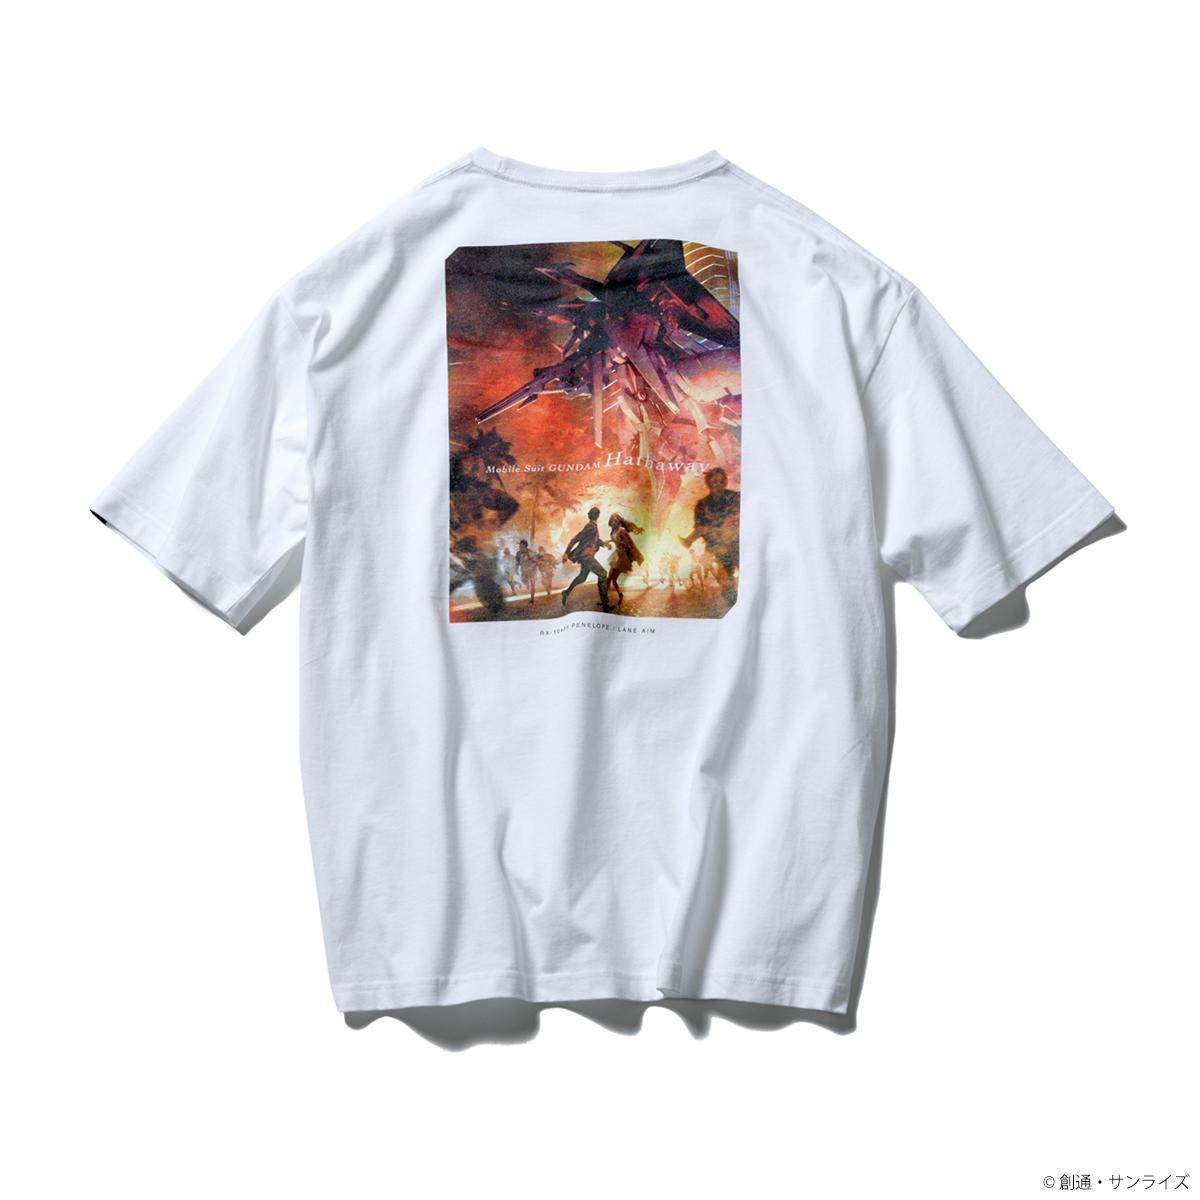 STRICT-G『機動戦士ガンダム 閃光のハサウェイ』 ポケット付きビッグTシャツ コンセプトビジュアル